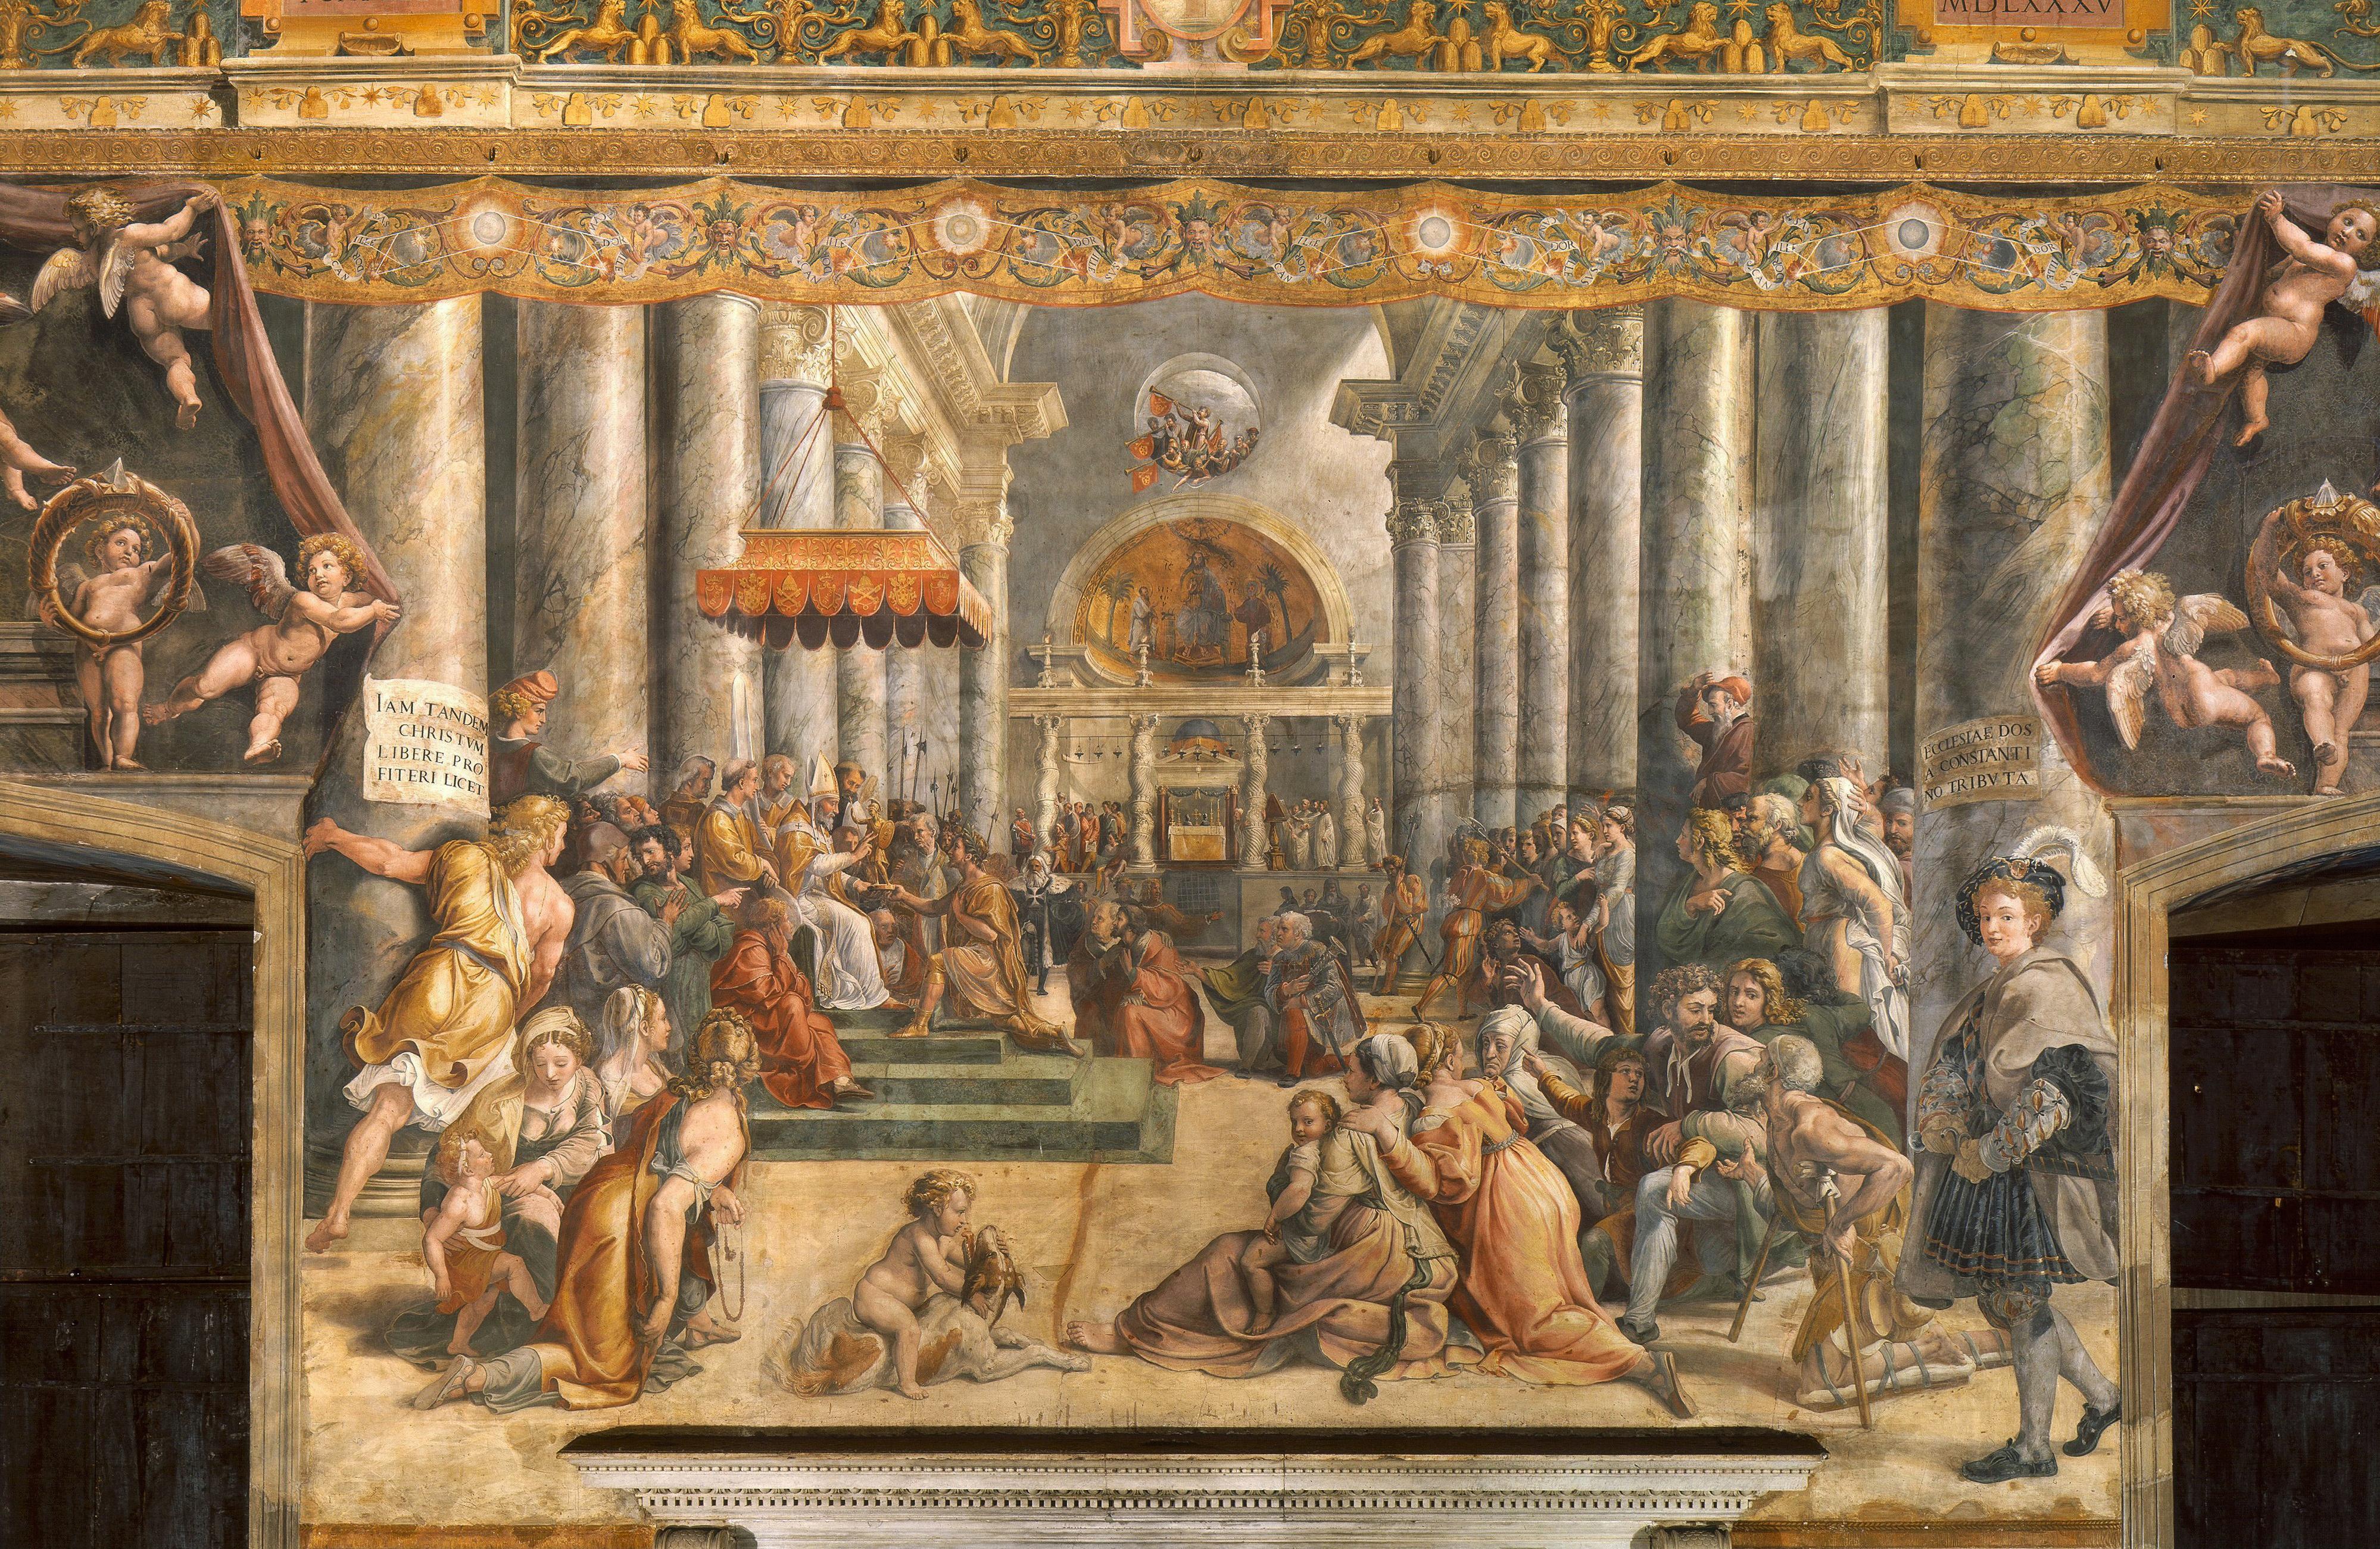 Рафаэль. Пожертвование Константина. 1520